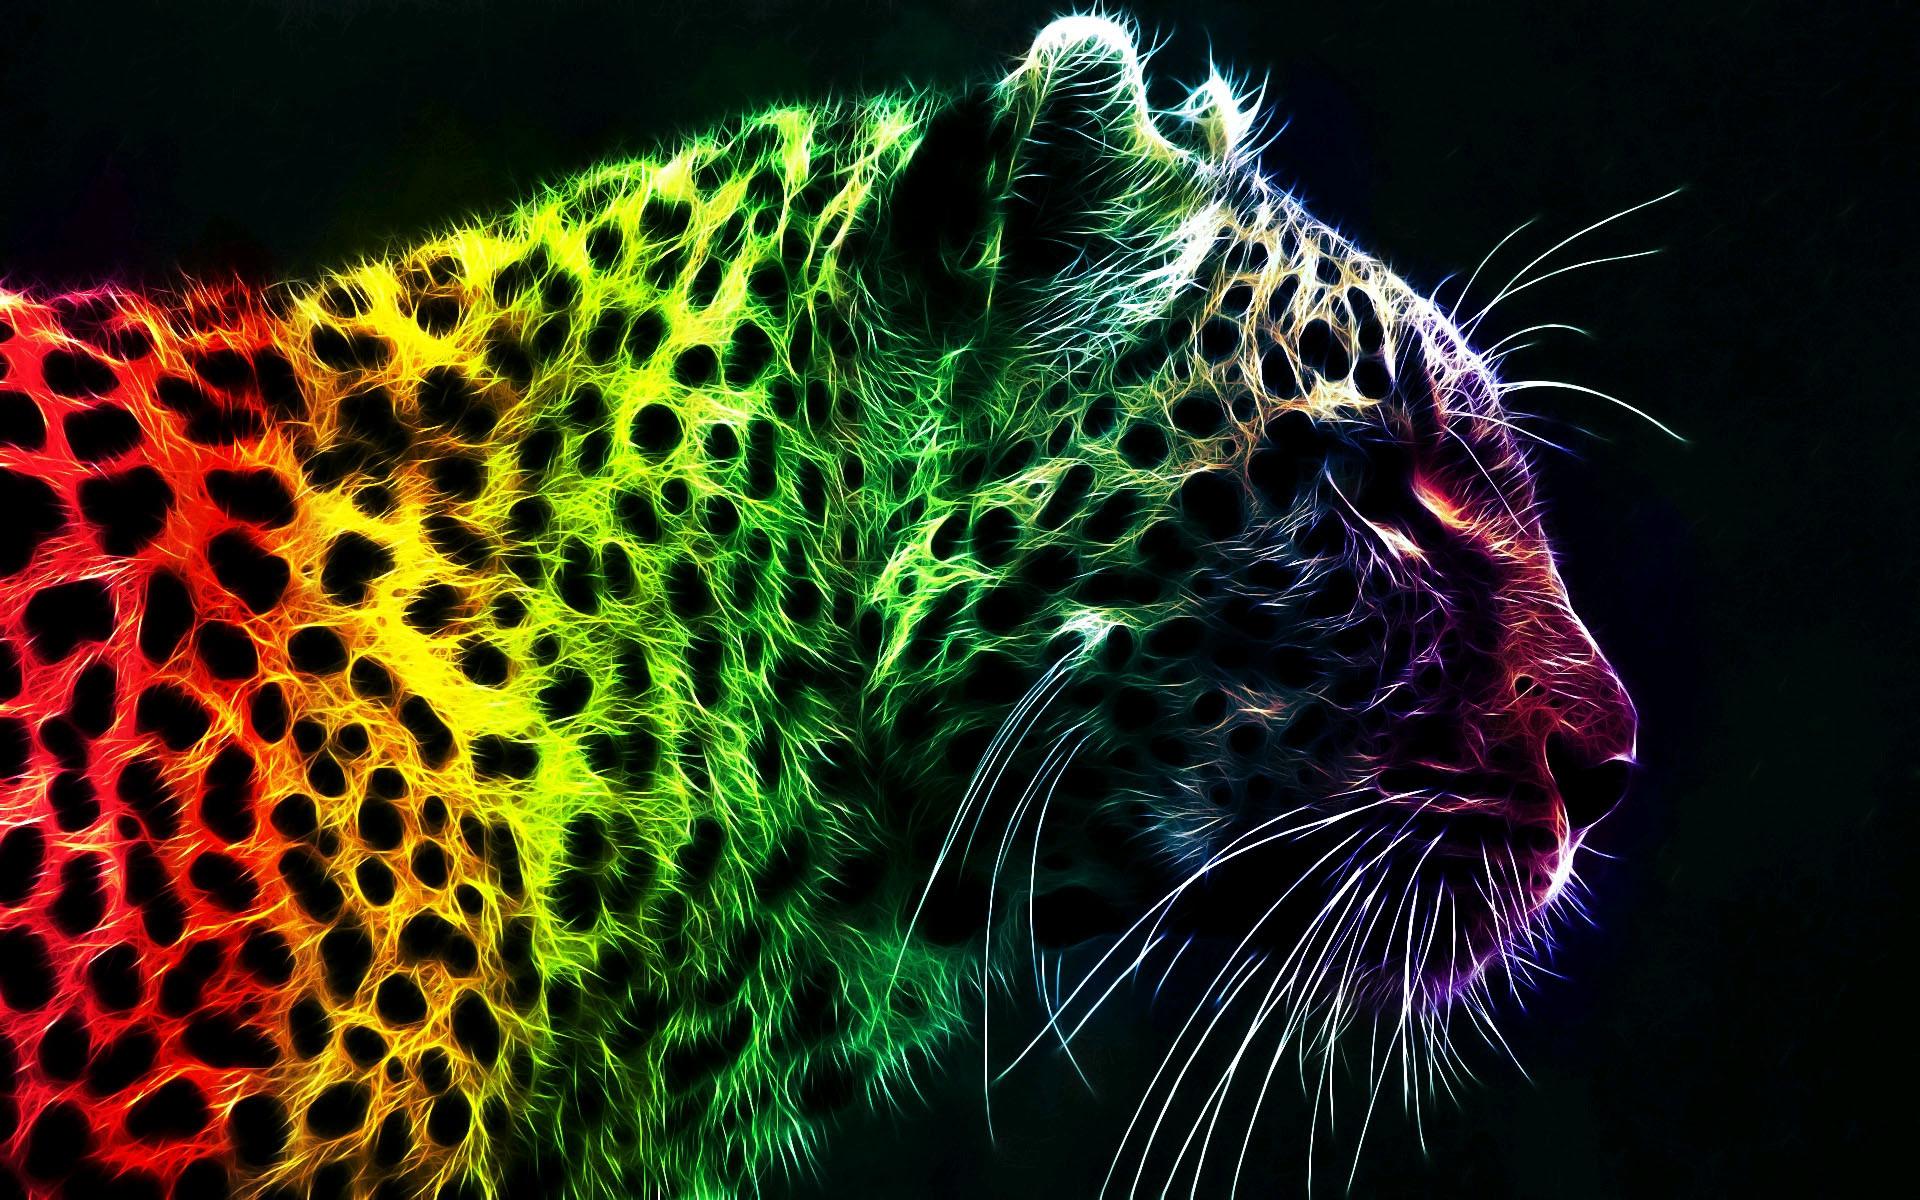 Colorful Leopard Backgrounds, wallpaper, Colorful Leopard Backgrounds .